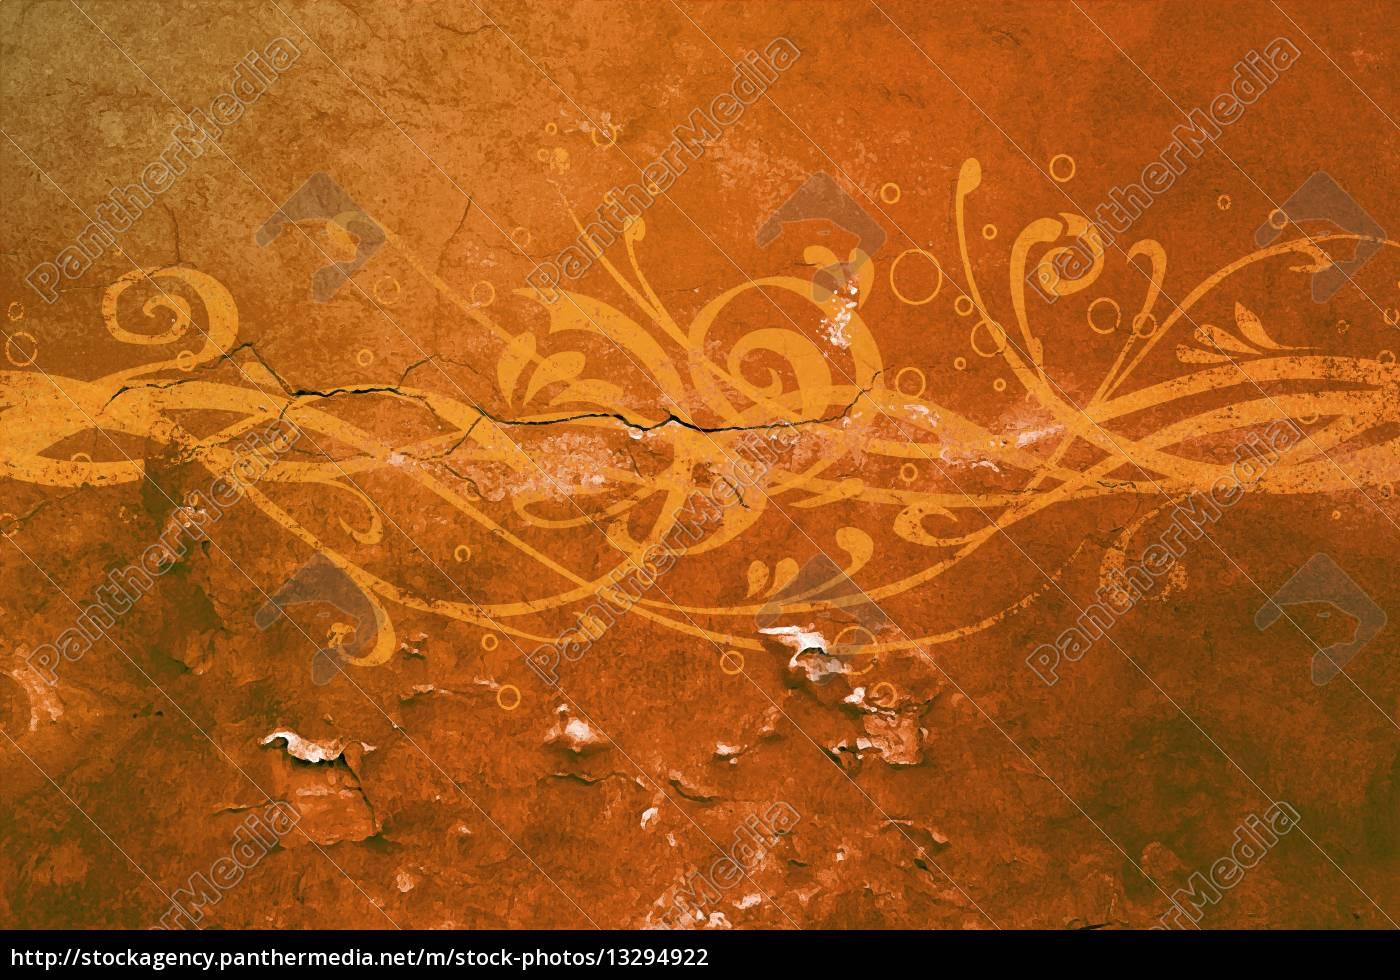 Mauer Ornament Wand Dirty Putz Kunst Orange Muster Stock Photo